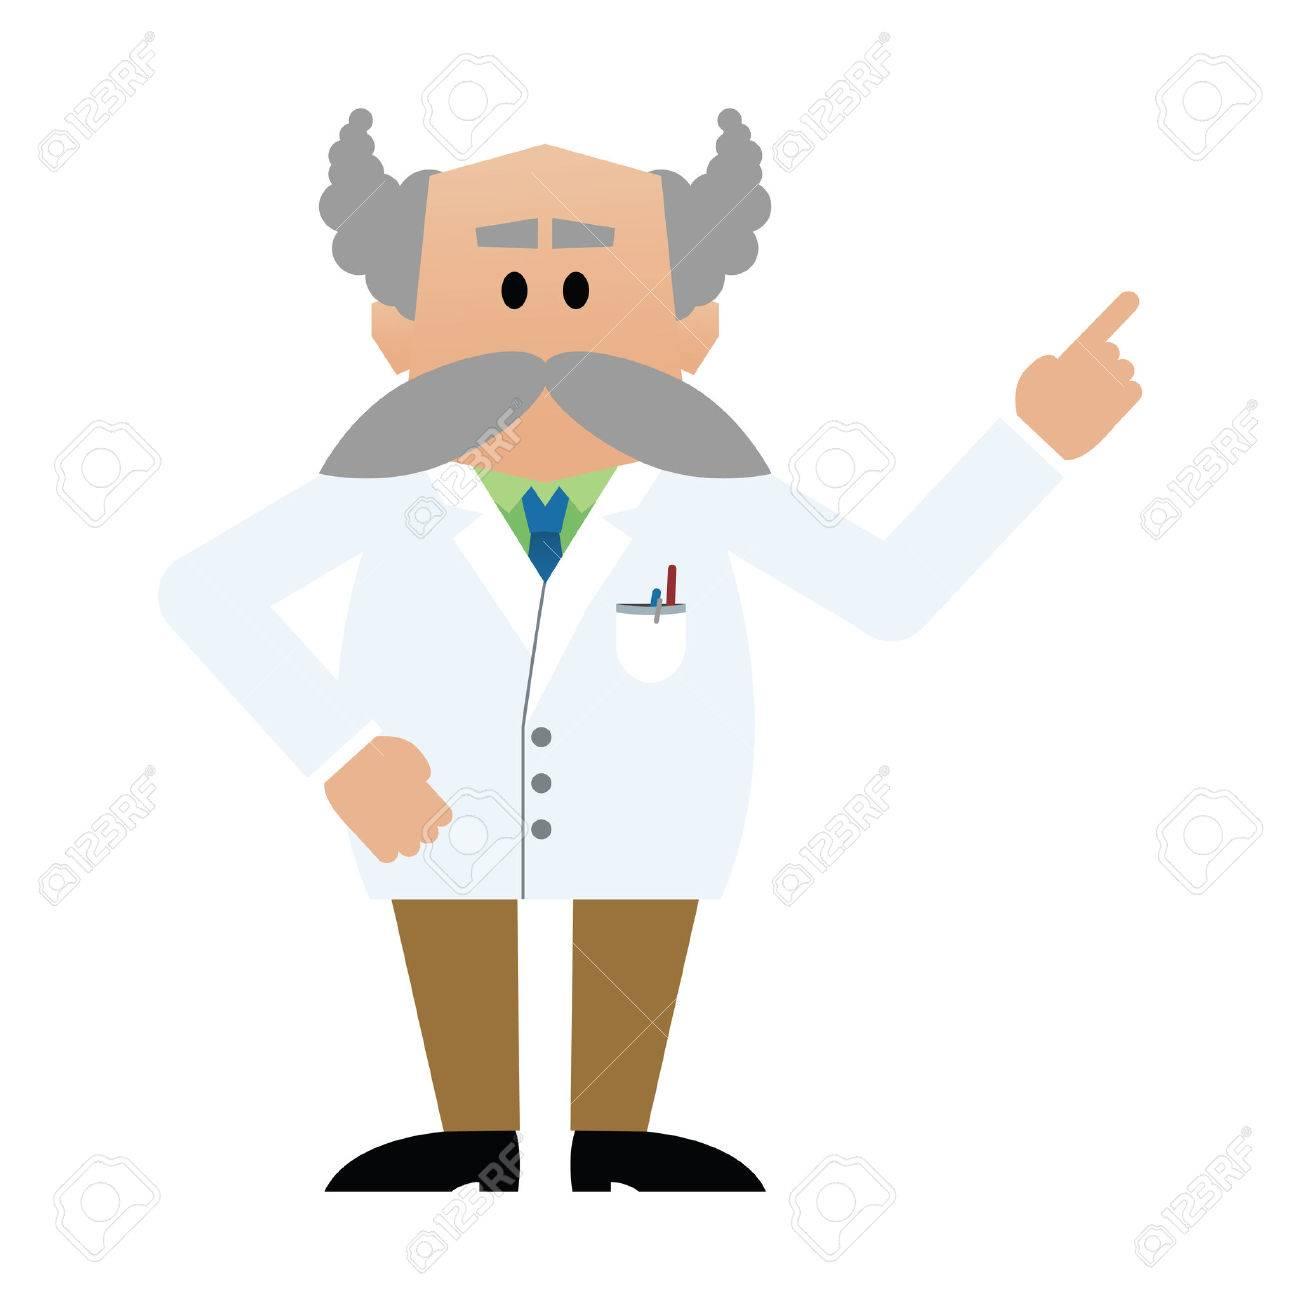 Cartoon professor with moustache - 39554205